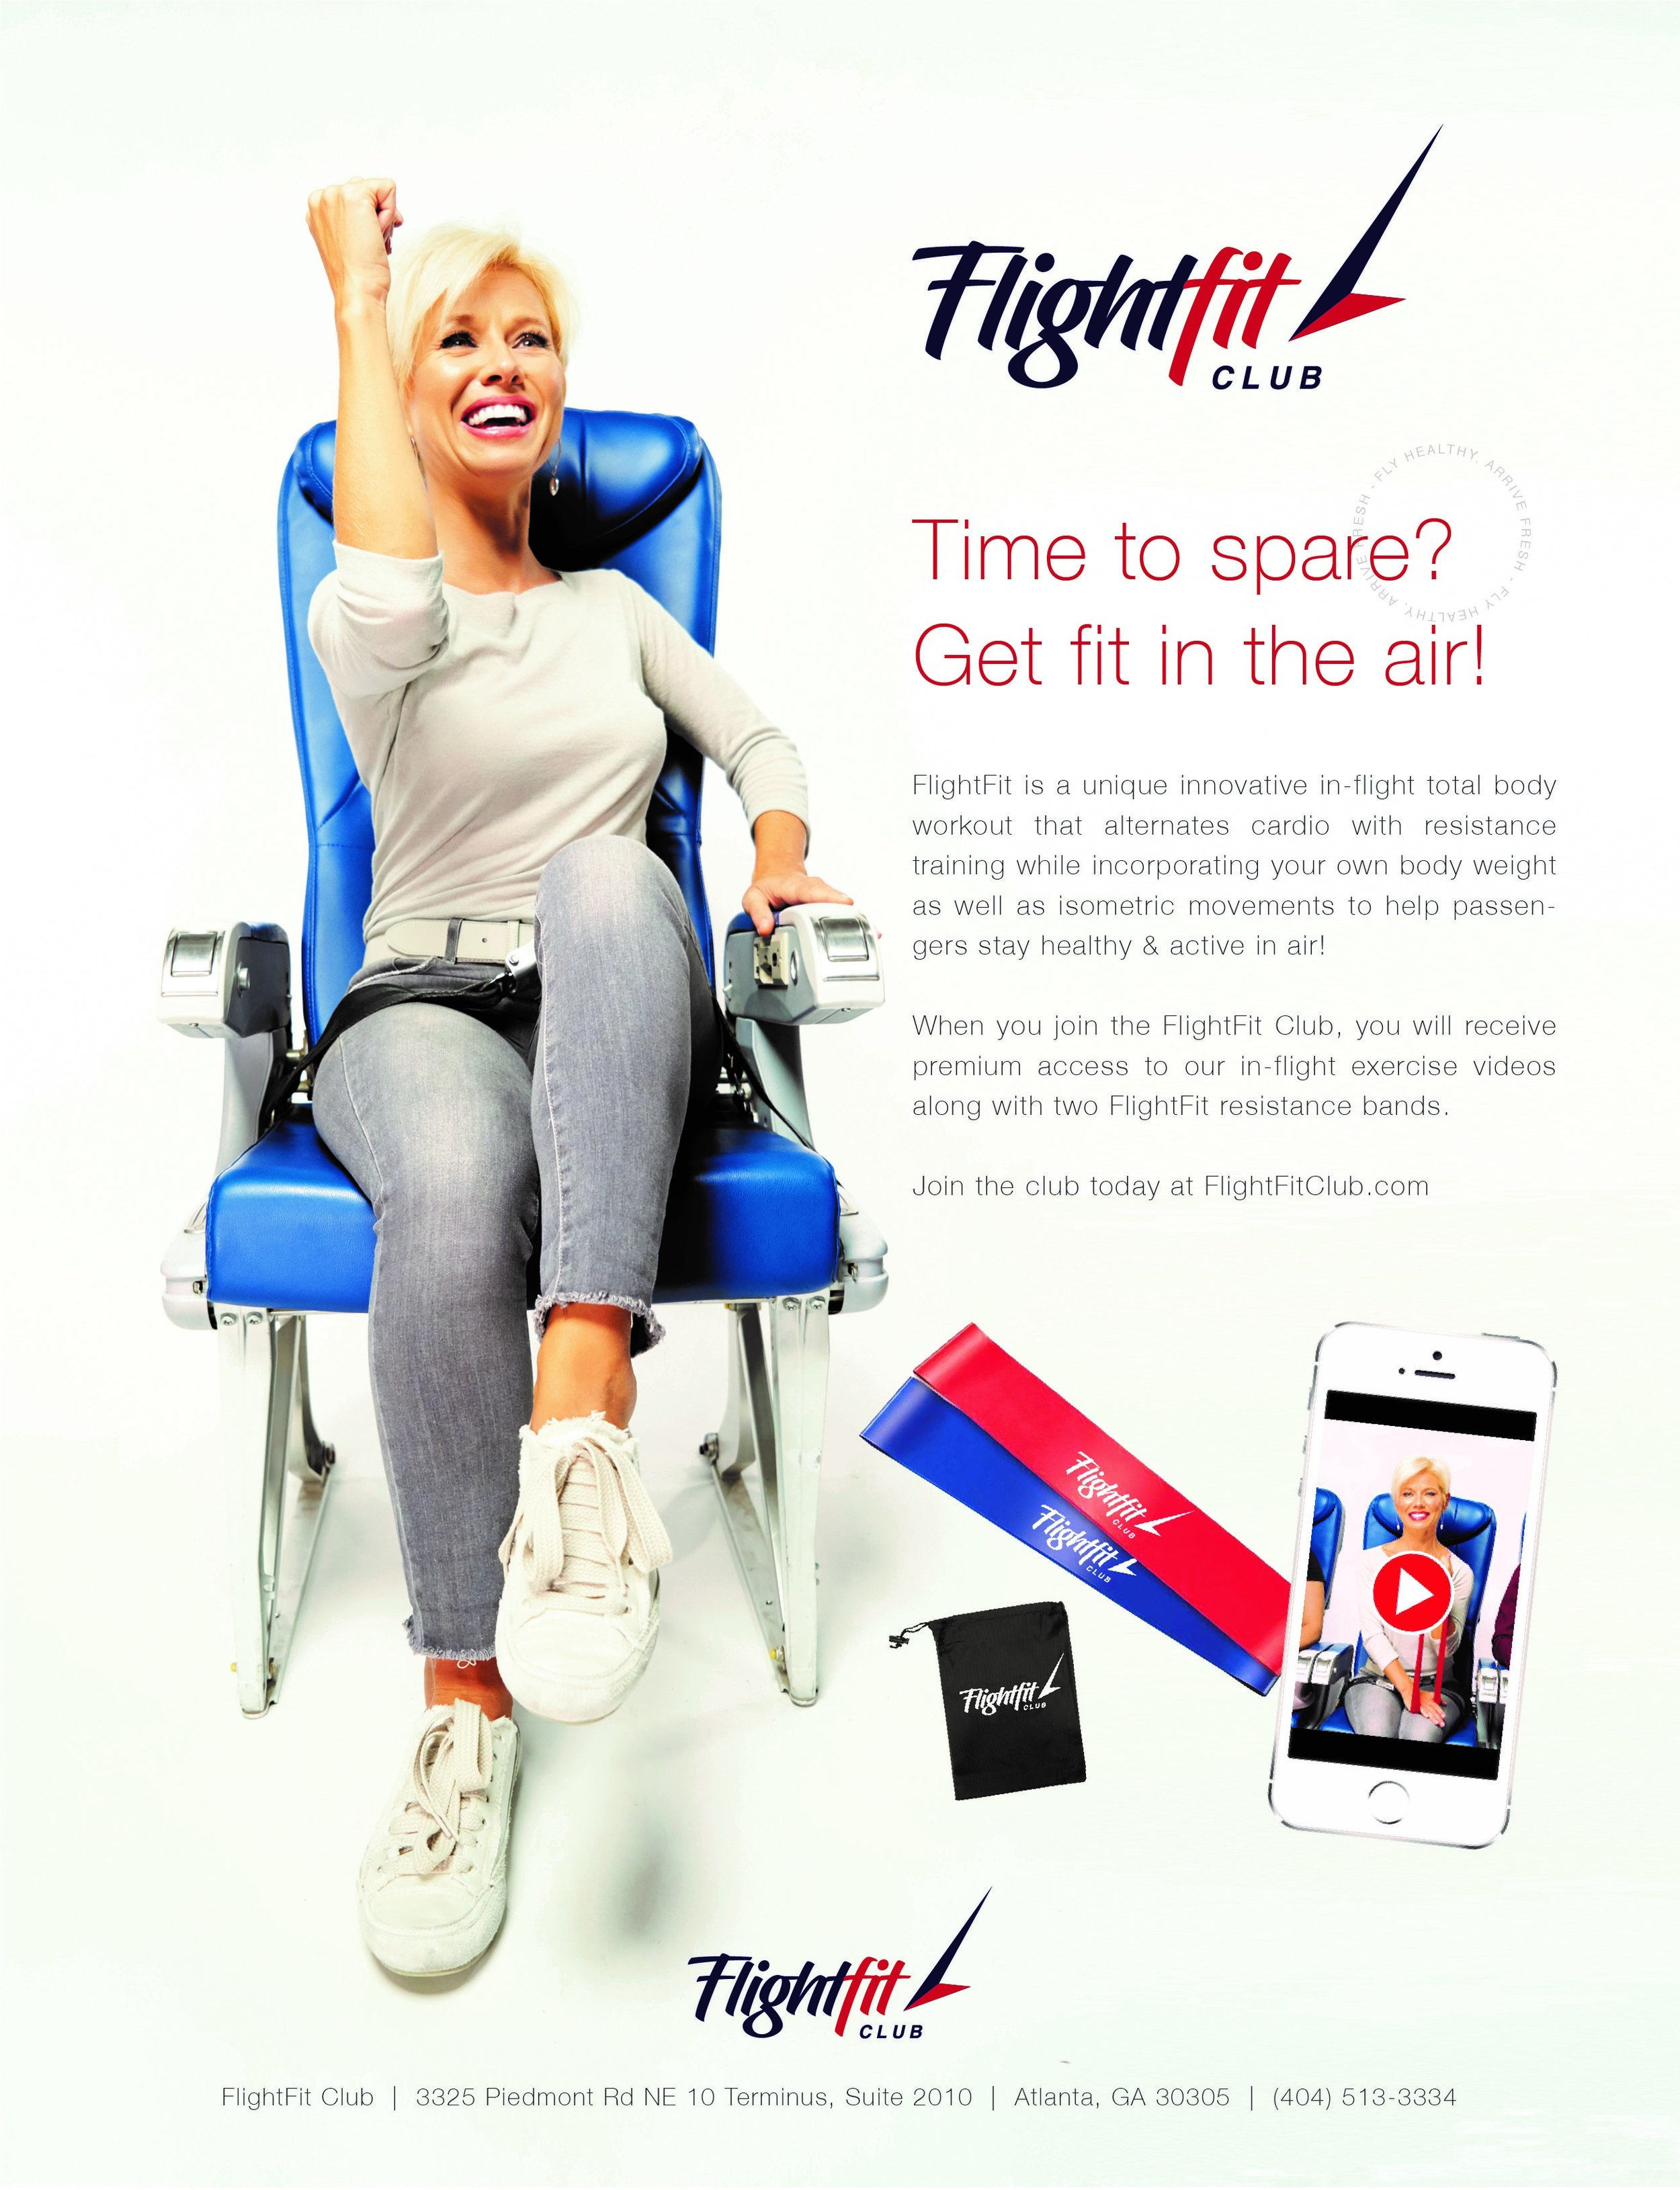 flightfit a creatively fun airplane workout.jpg